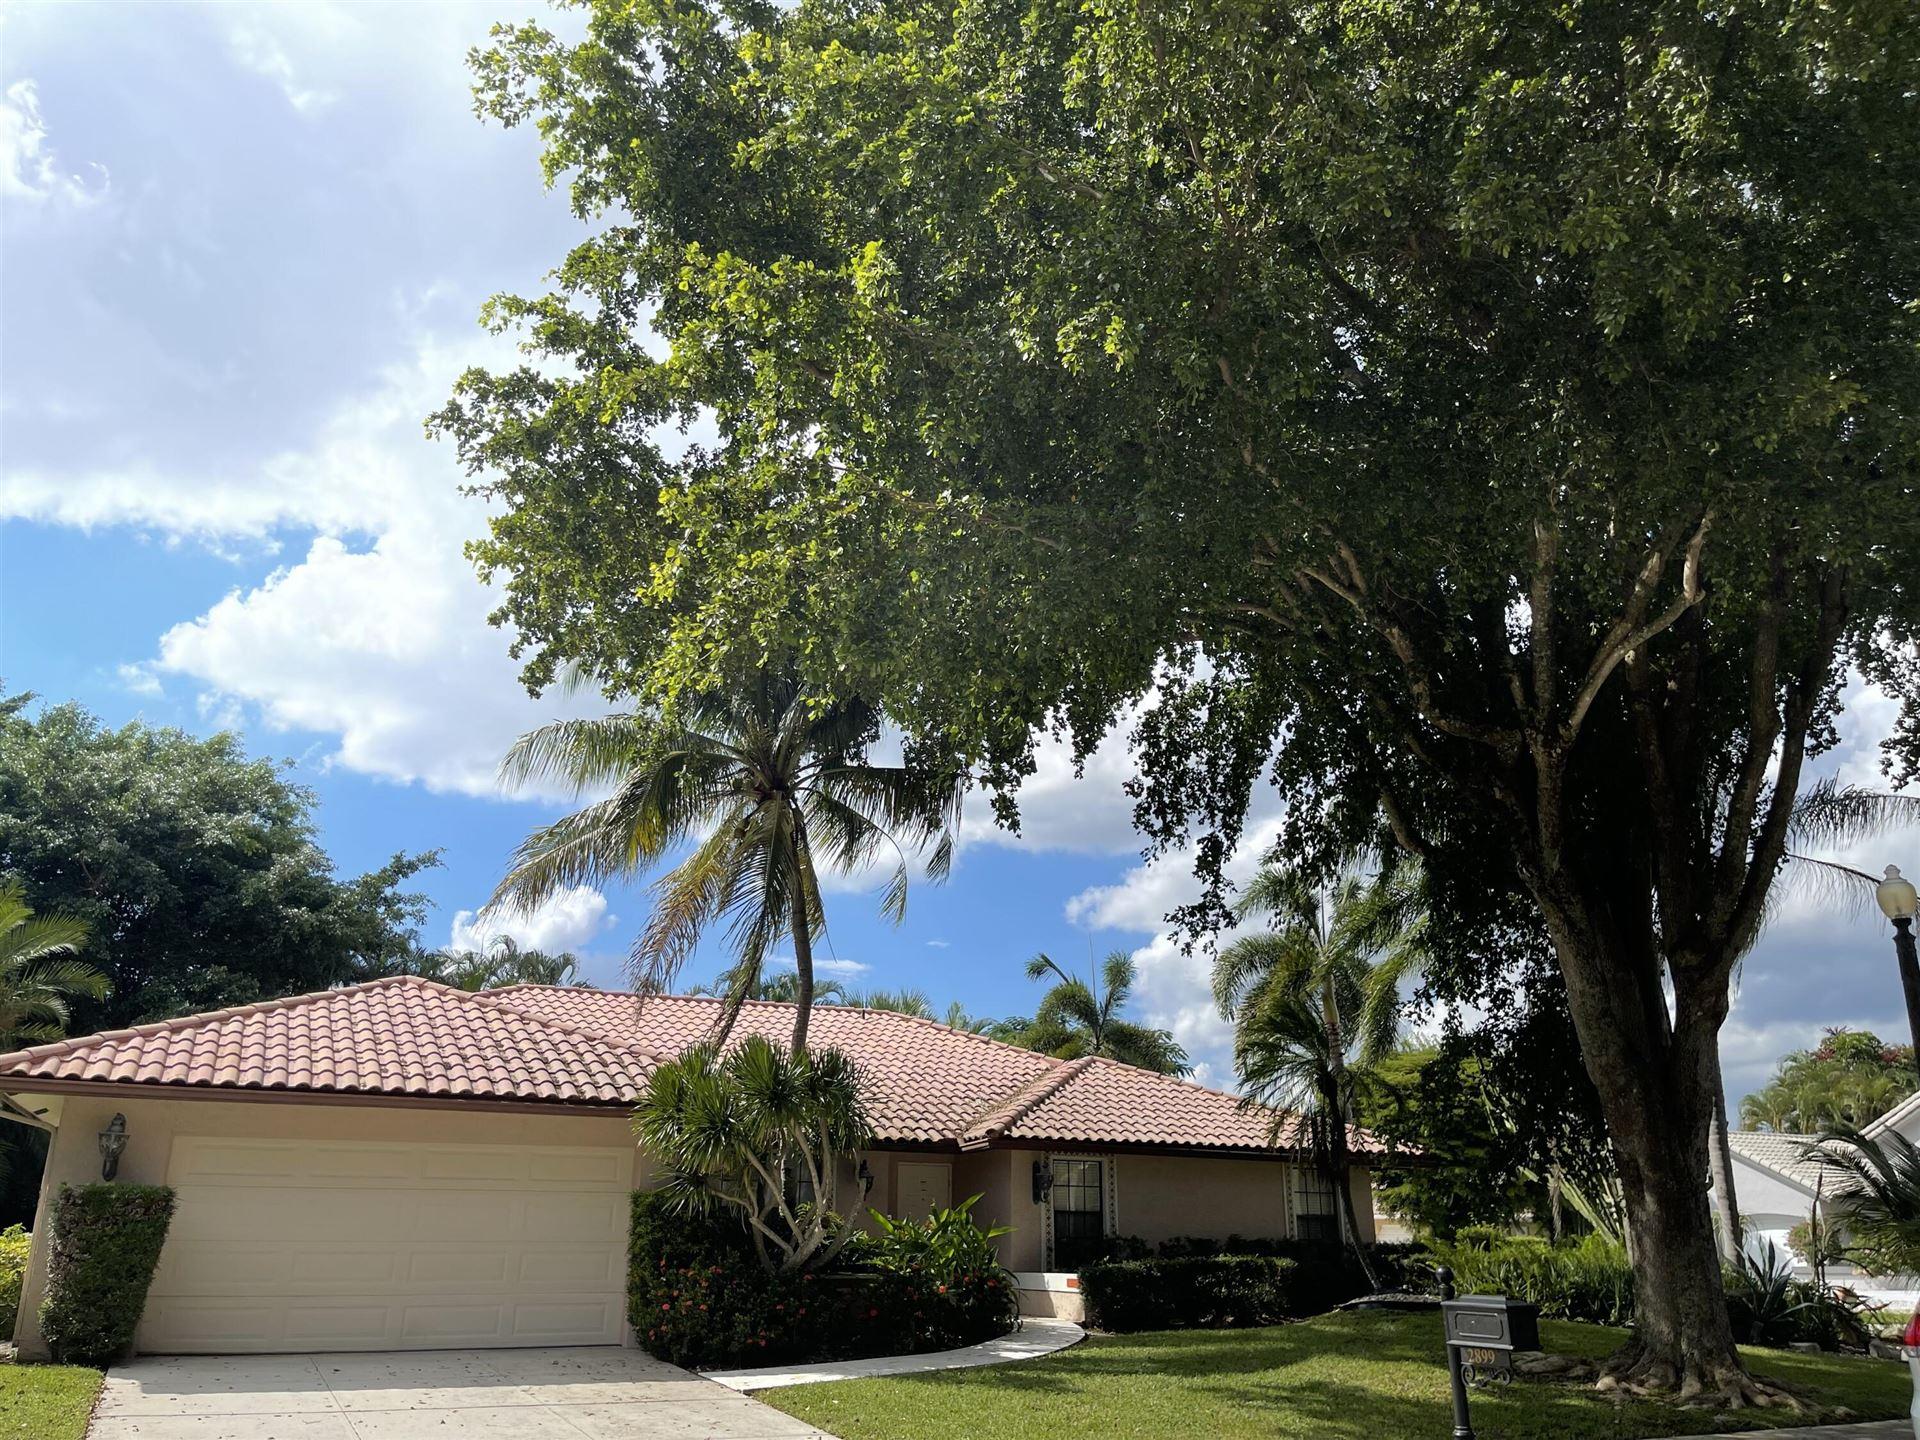 Photo of 2899 NW 26th Avenue, Boca Raton, FL 33434 (MLS # RX-10752529)